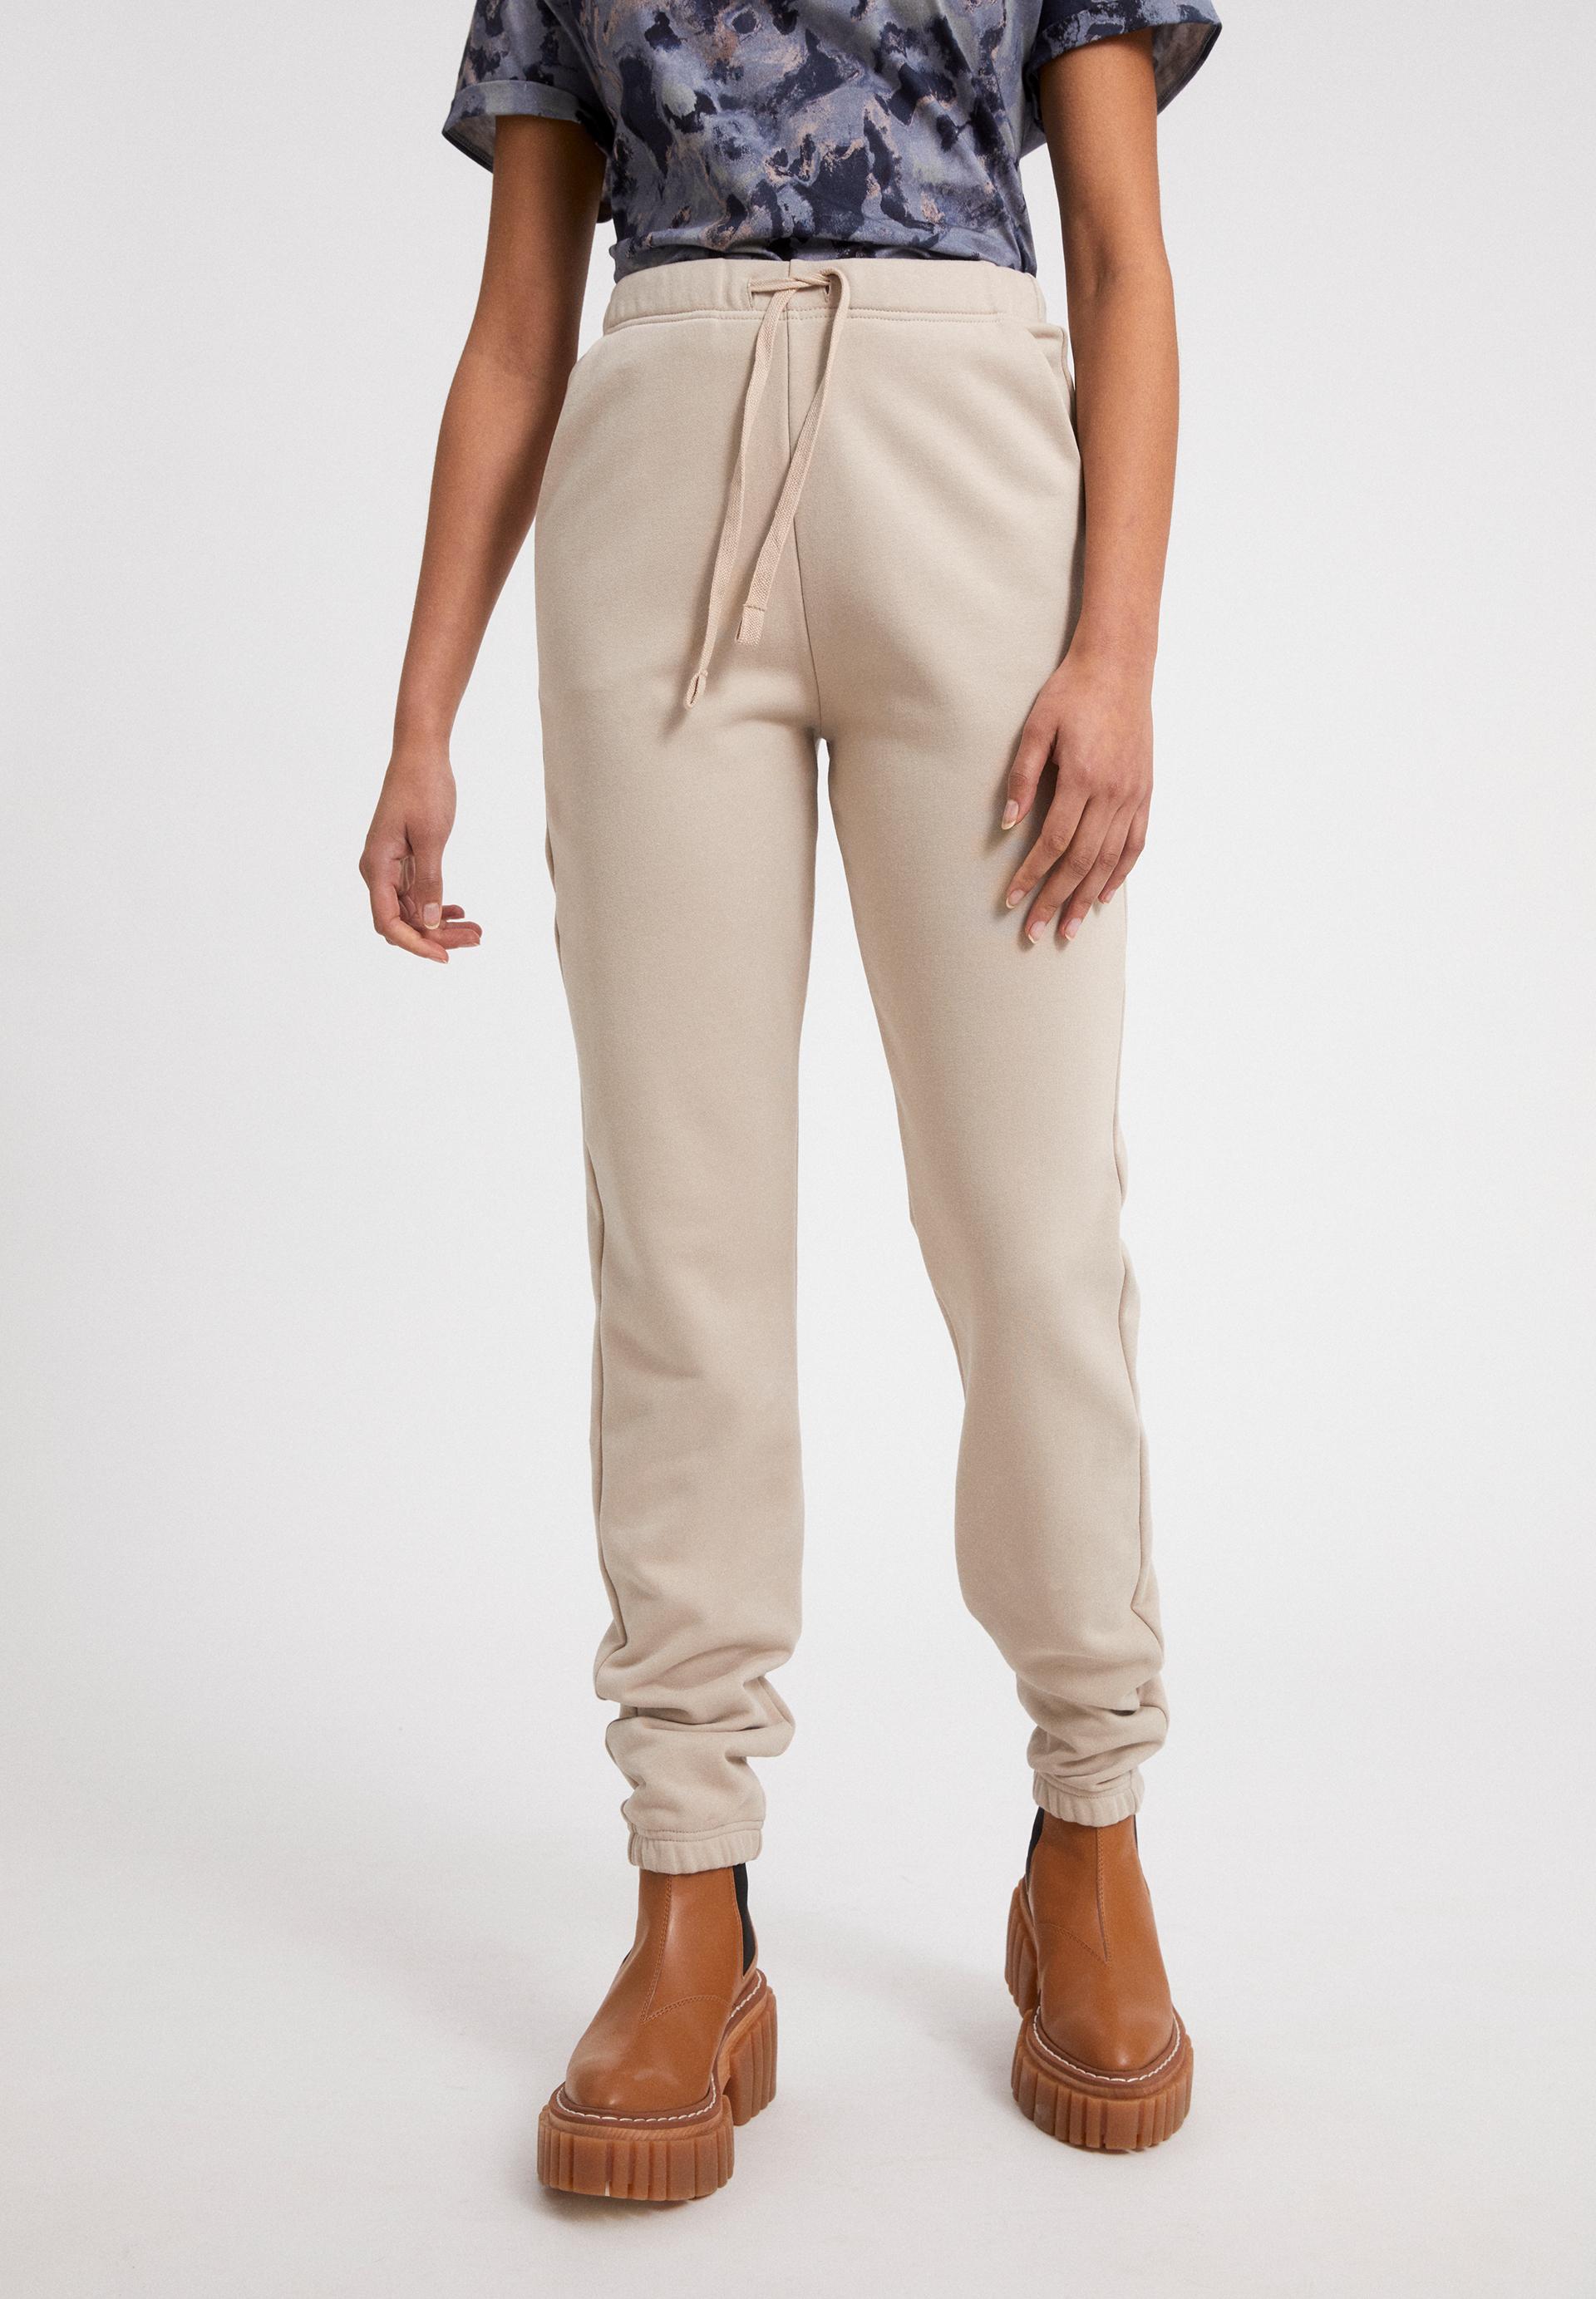 IVAA Sweat Pants made of Organic Cotton